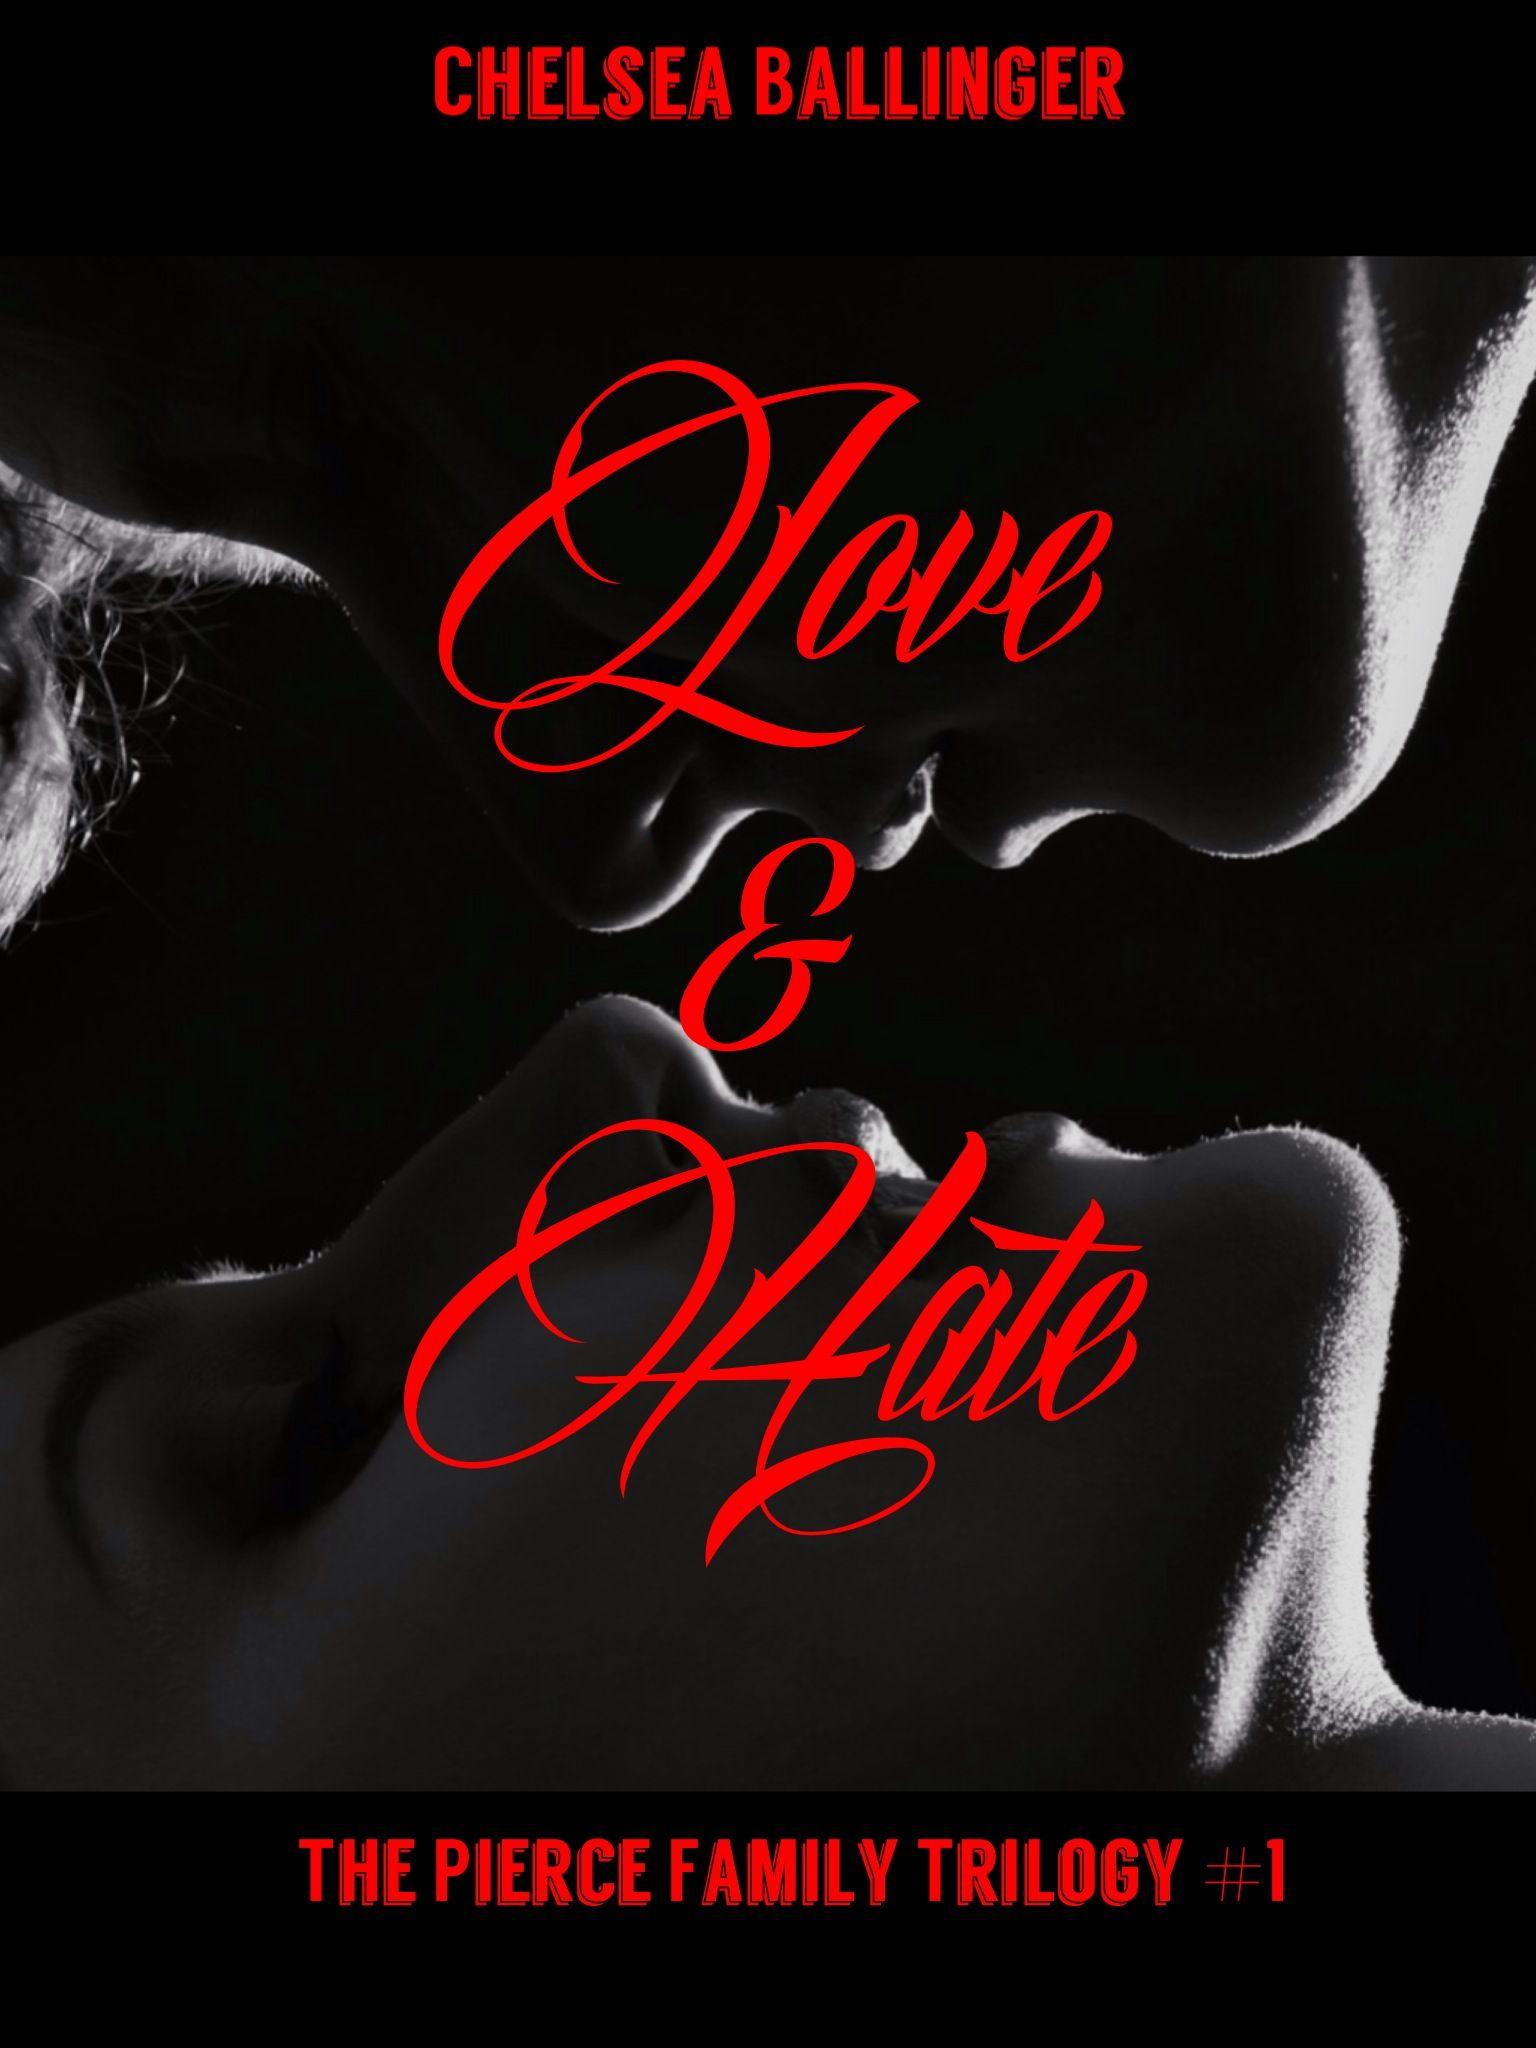 Httpamazonlove hate pierce family trilogy ebookdp love and hate the pierce family trilogy book by chelsea ballinger fandeluxe Ebook collections